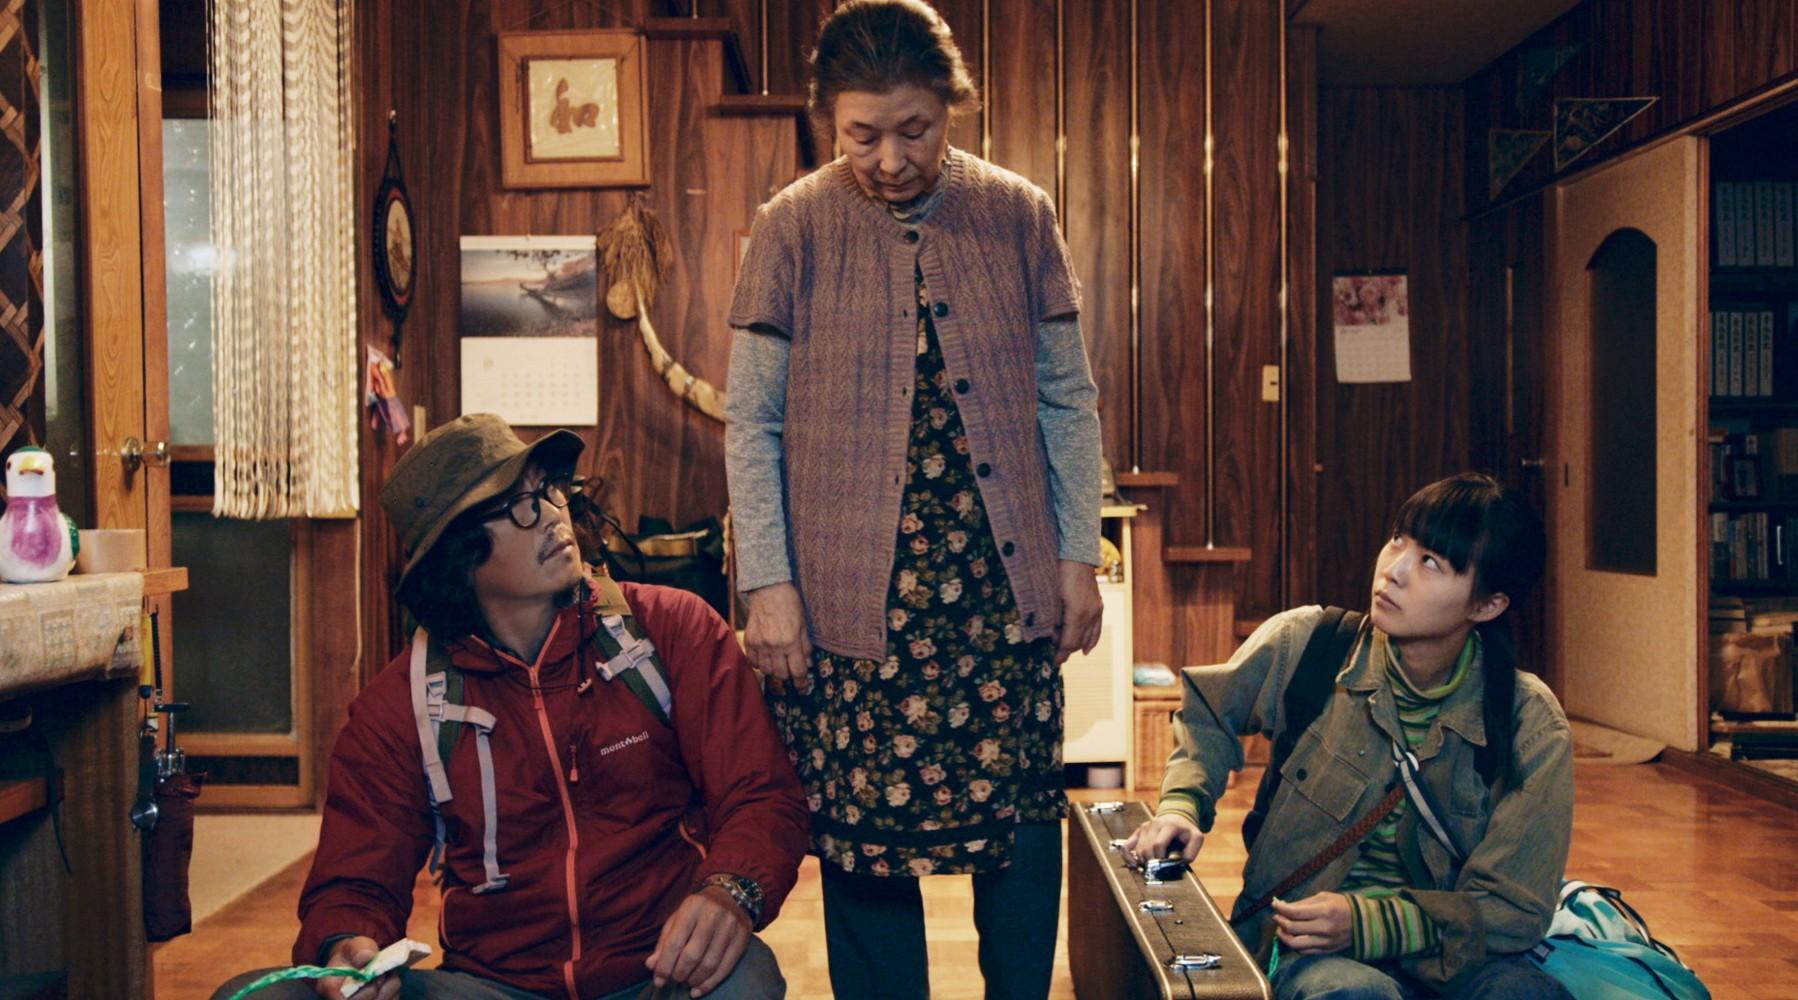 Ito recensione film di Yokohama Satoko con Komai Ren